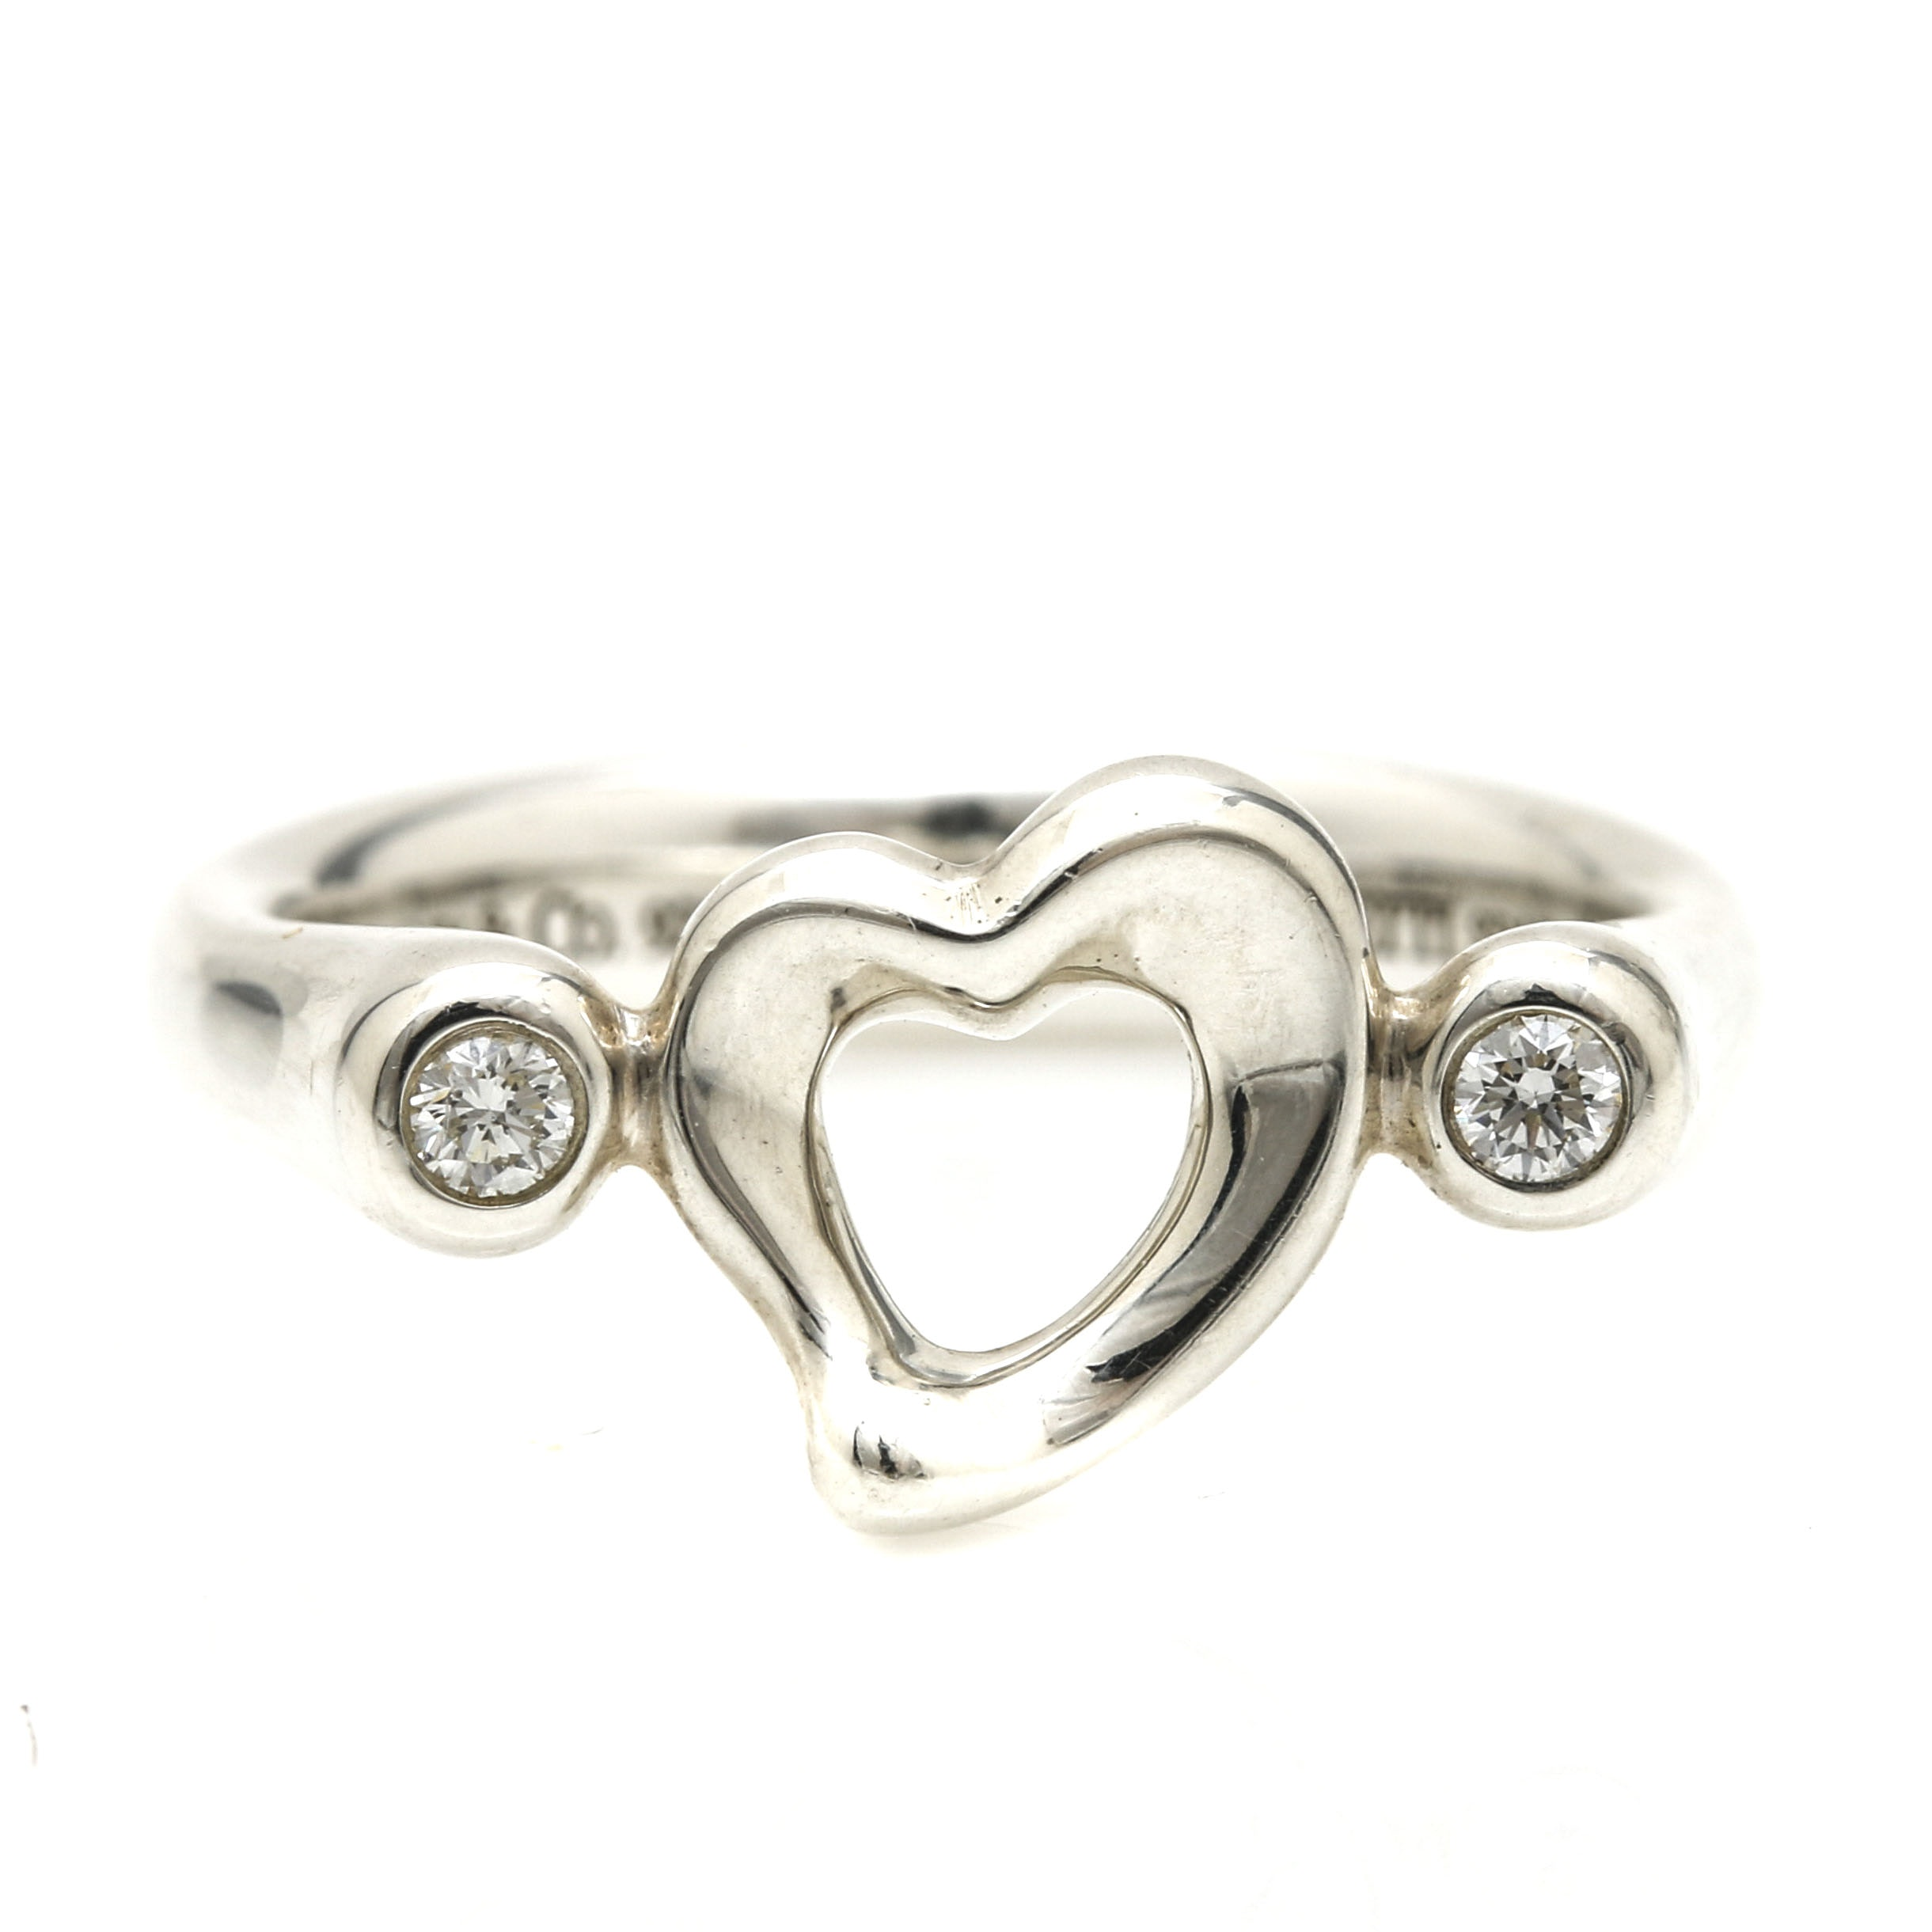 Tiffany & Co. Elsa Peretti Sterling Silver Open Heart Ring with Diamonds